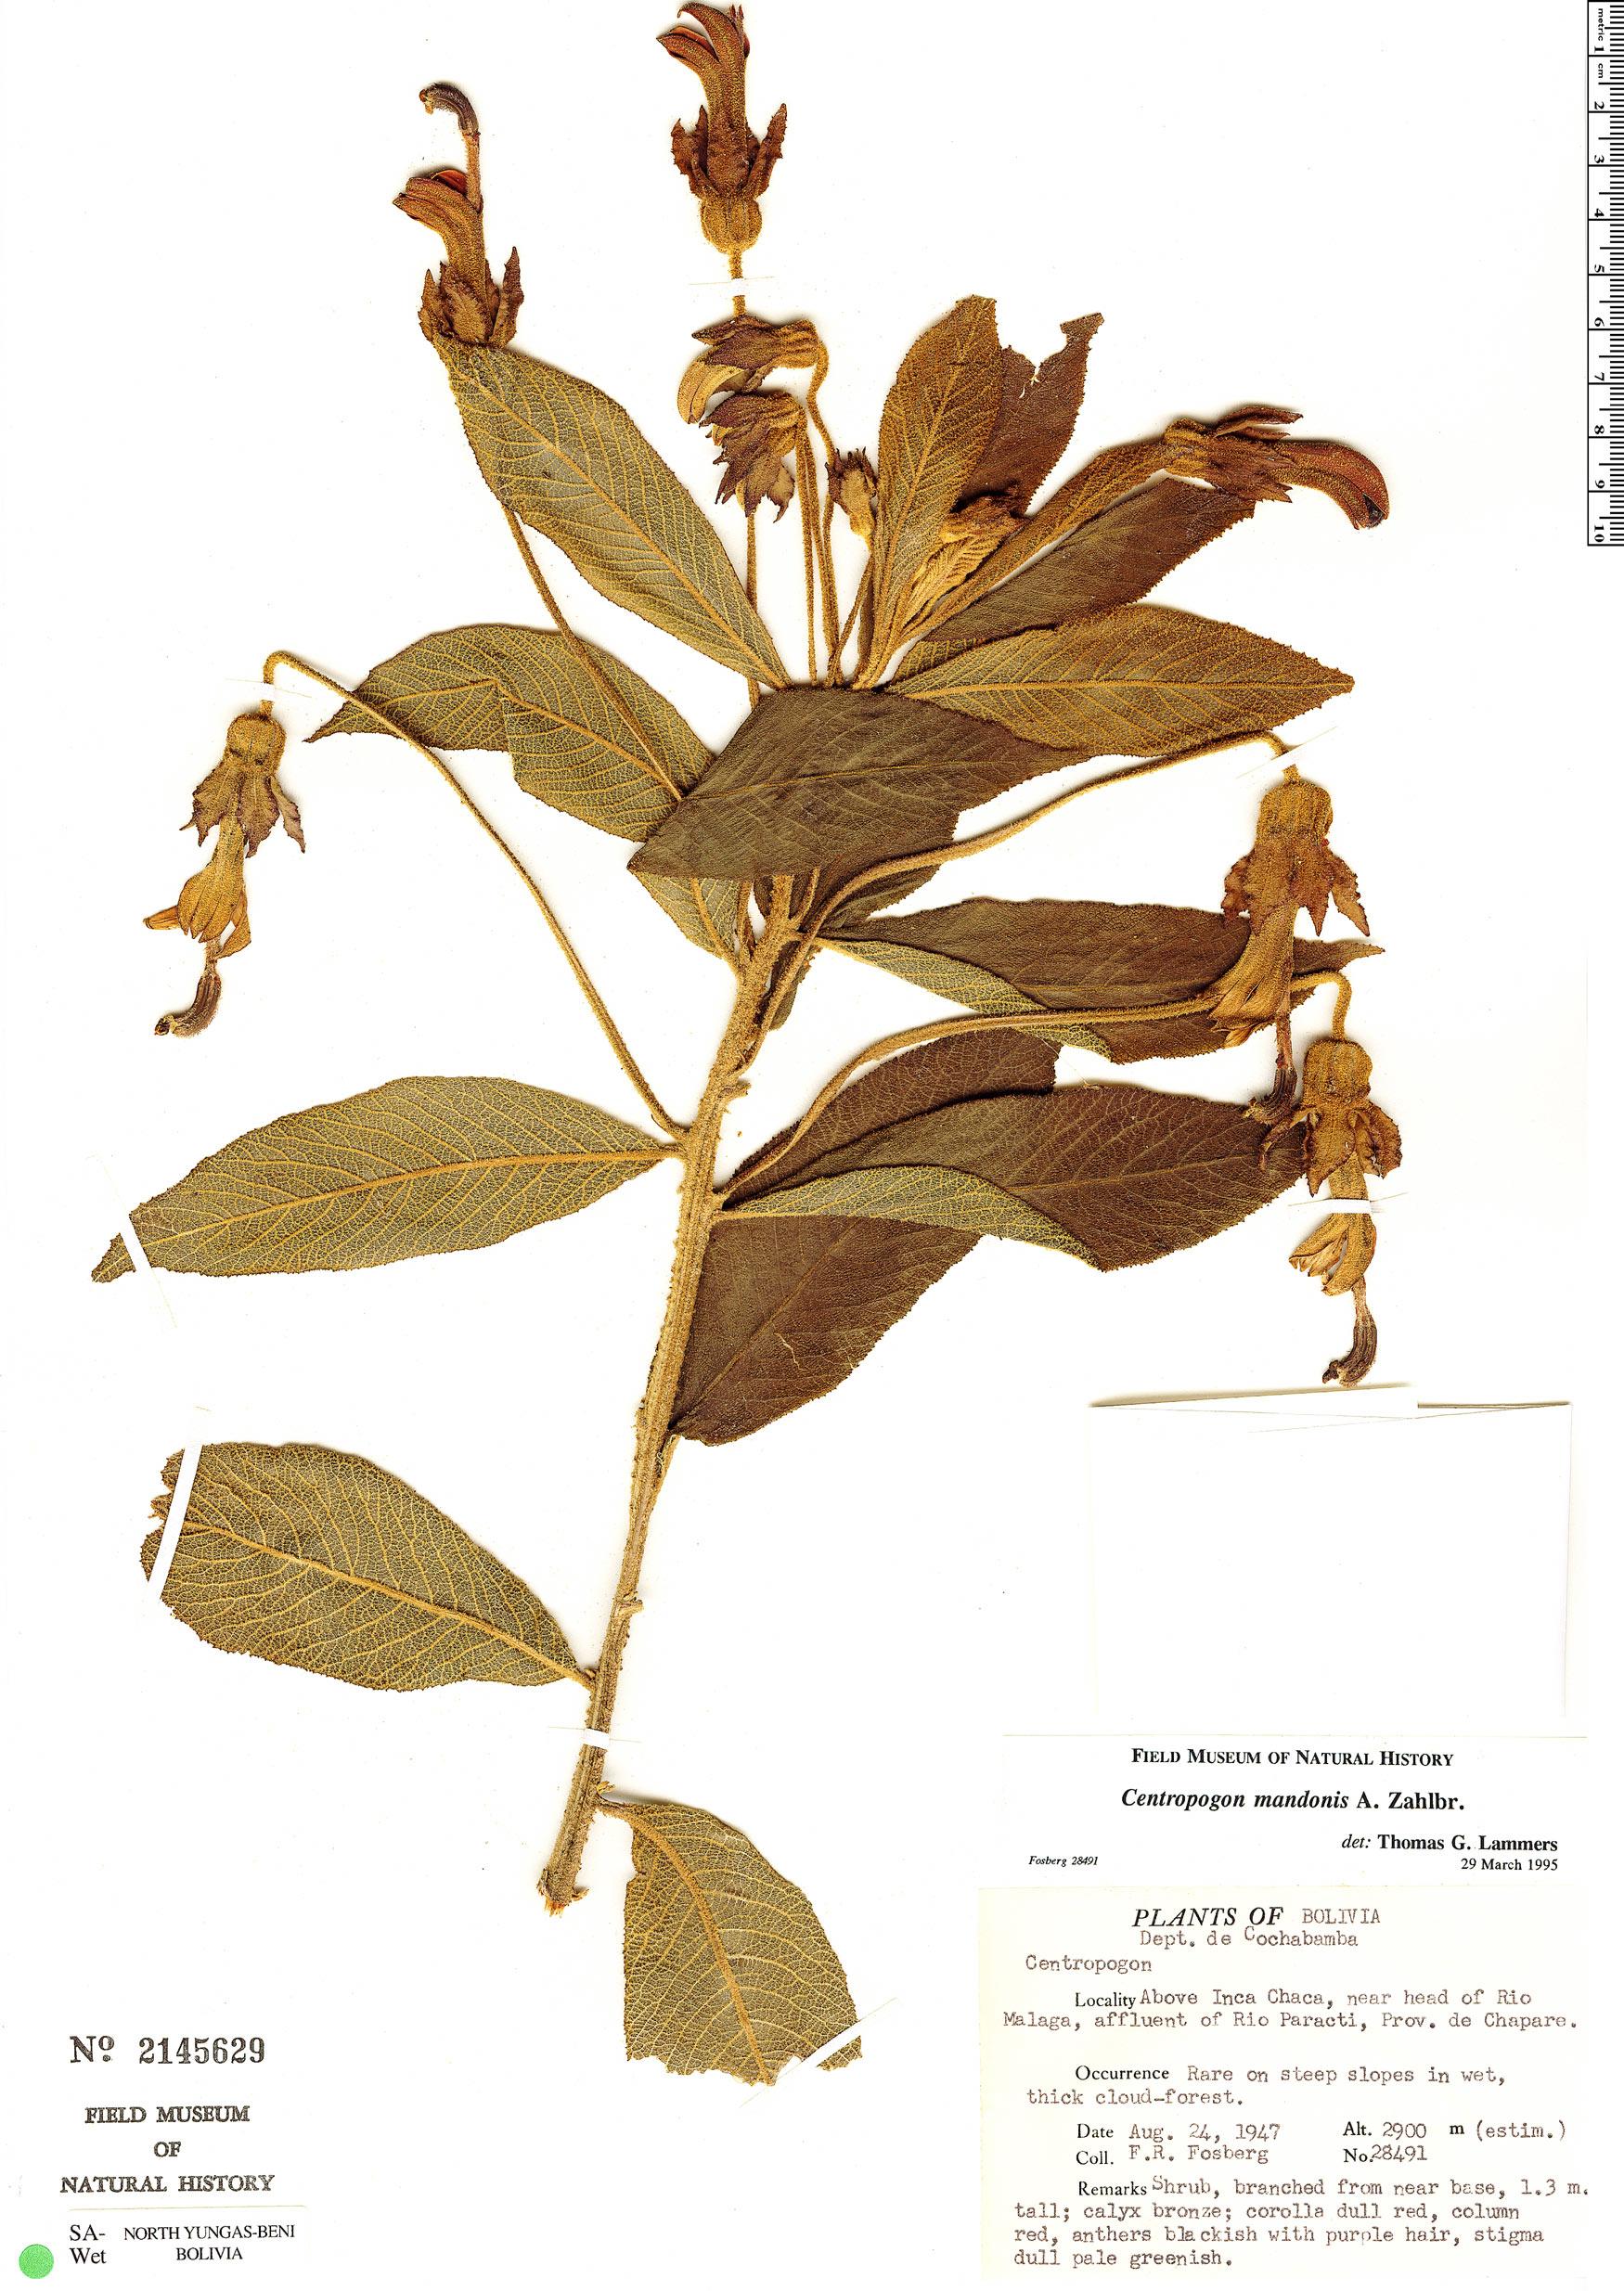 Specimen: Centropogon mandonis